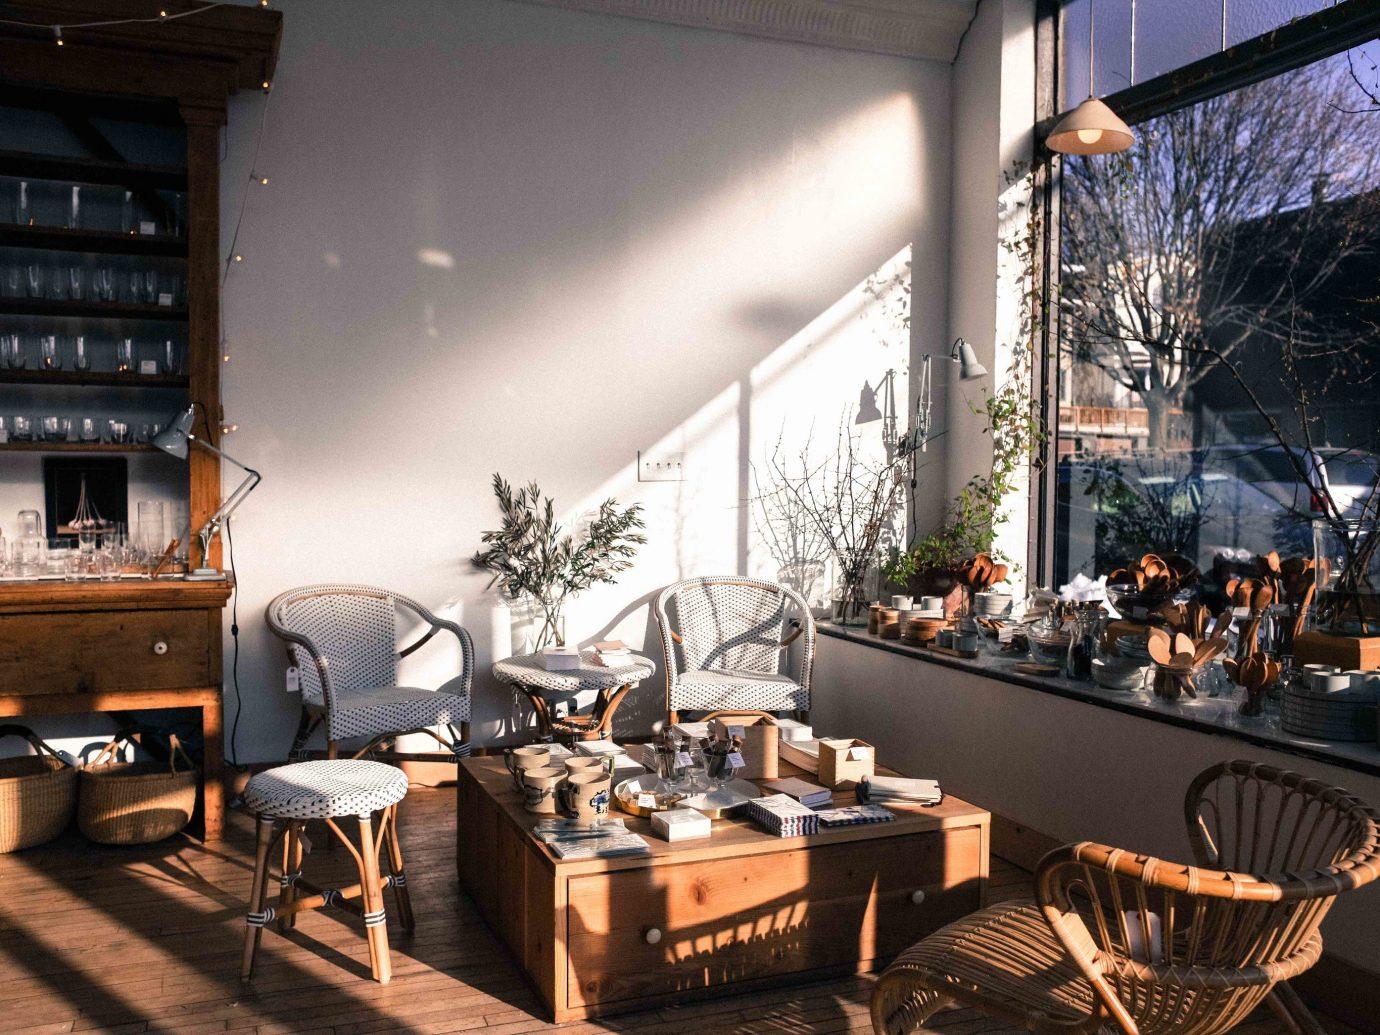 Trip Ideas indoor floor interior design restaurant café window furniture cluttered